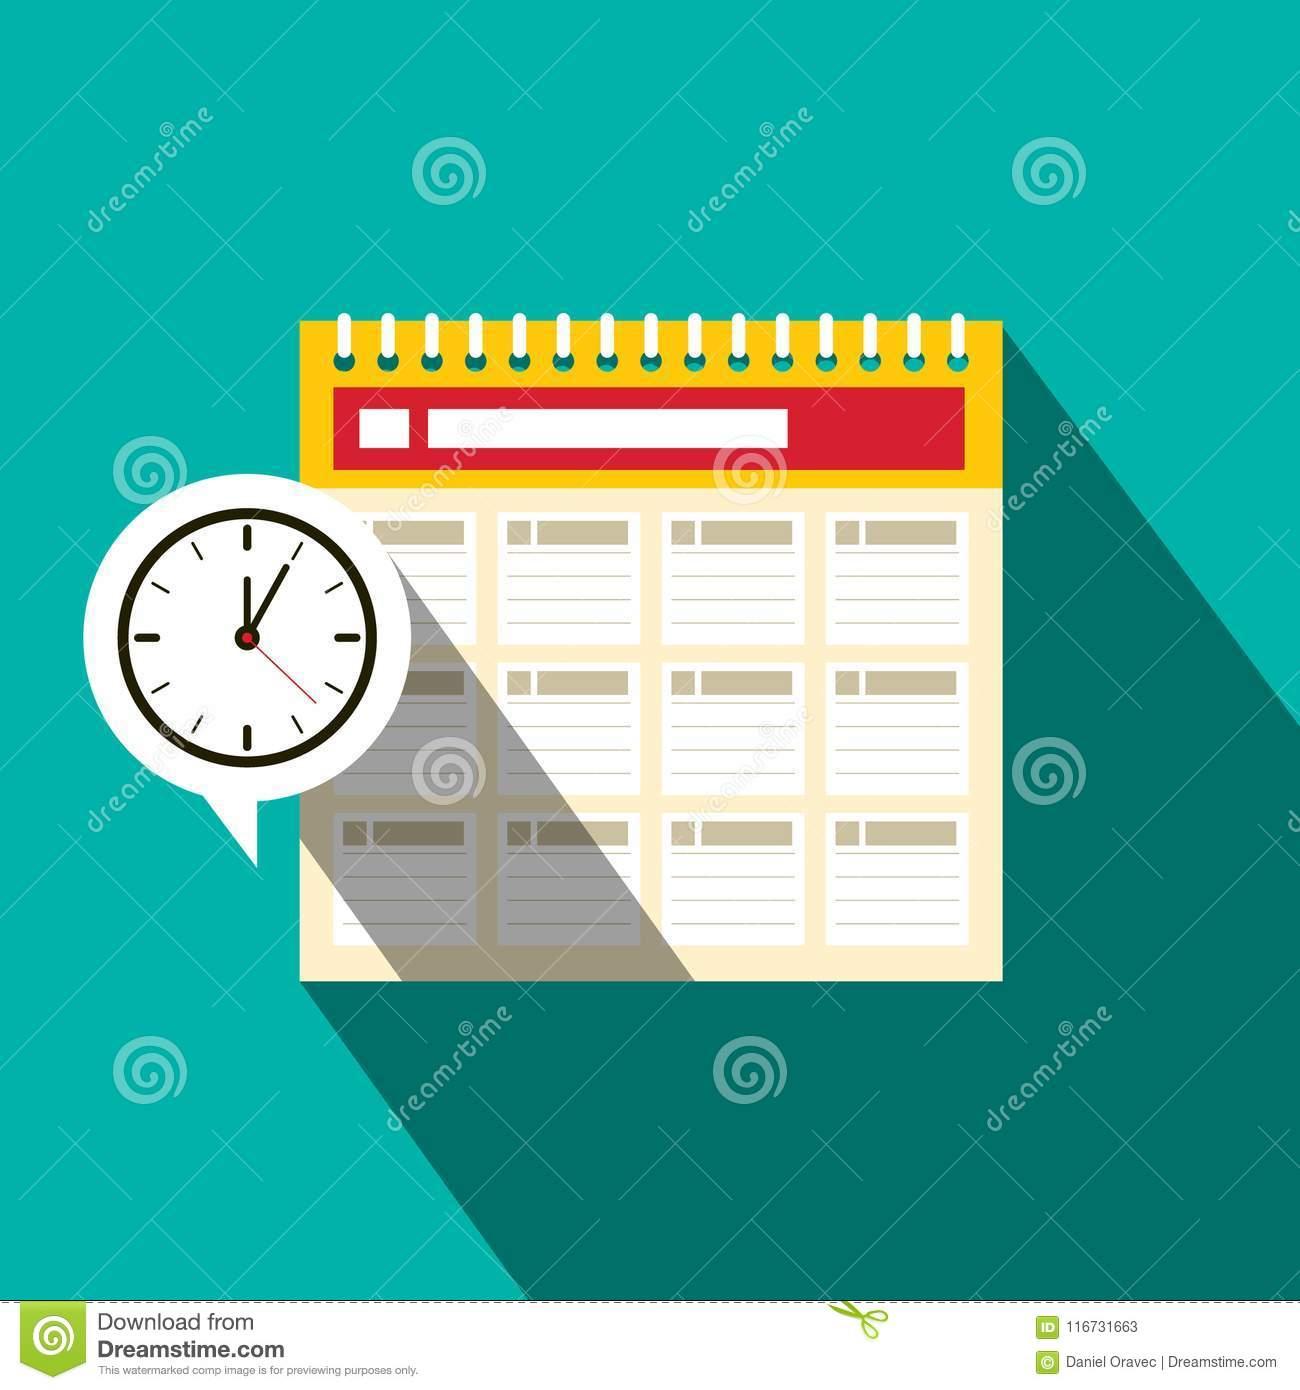 Calendar Icon With Clock. Schedule Flat Design Concept regarding Calendar Flat Design